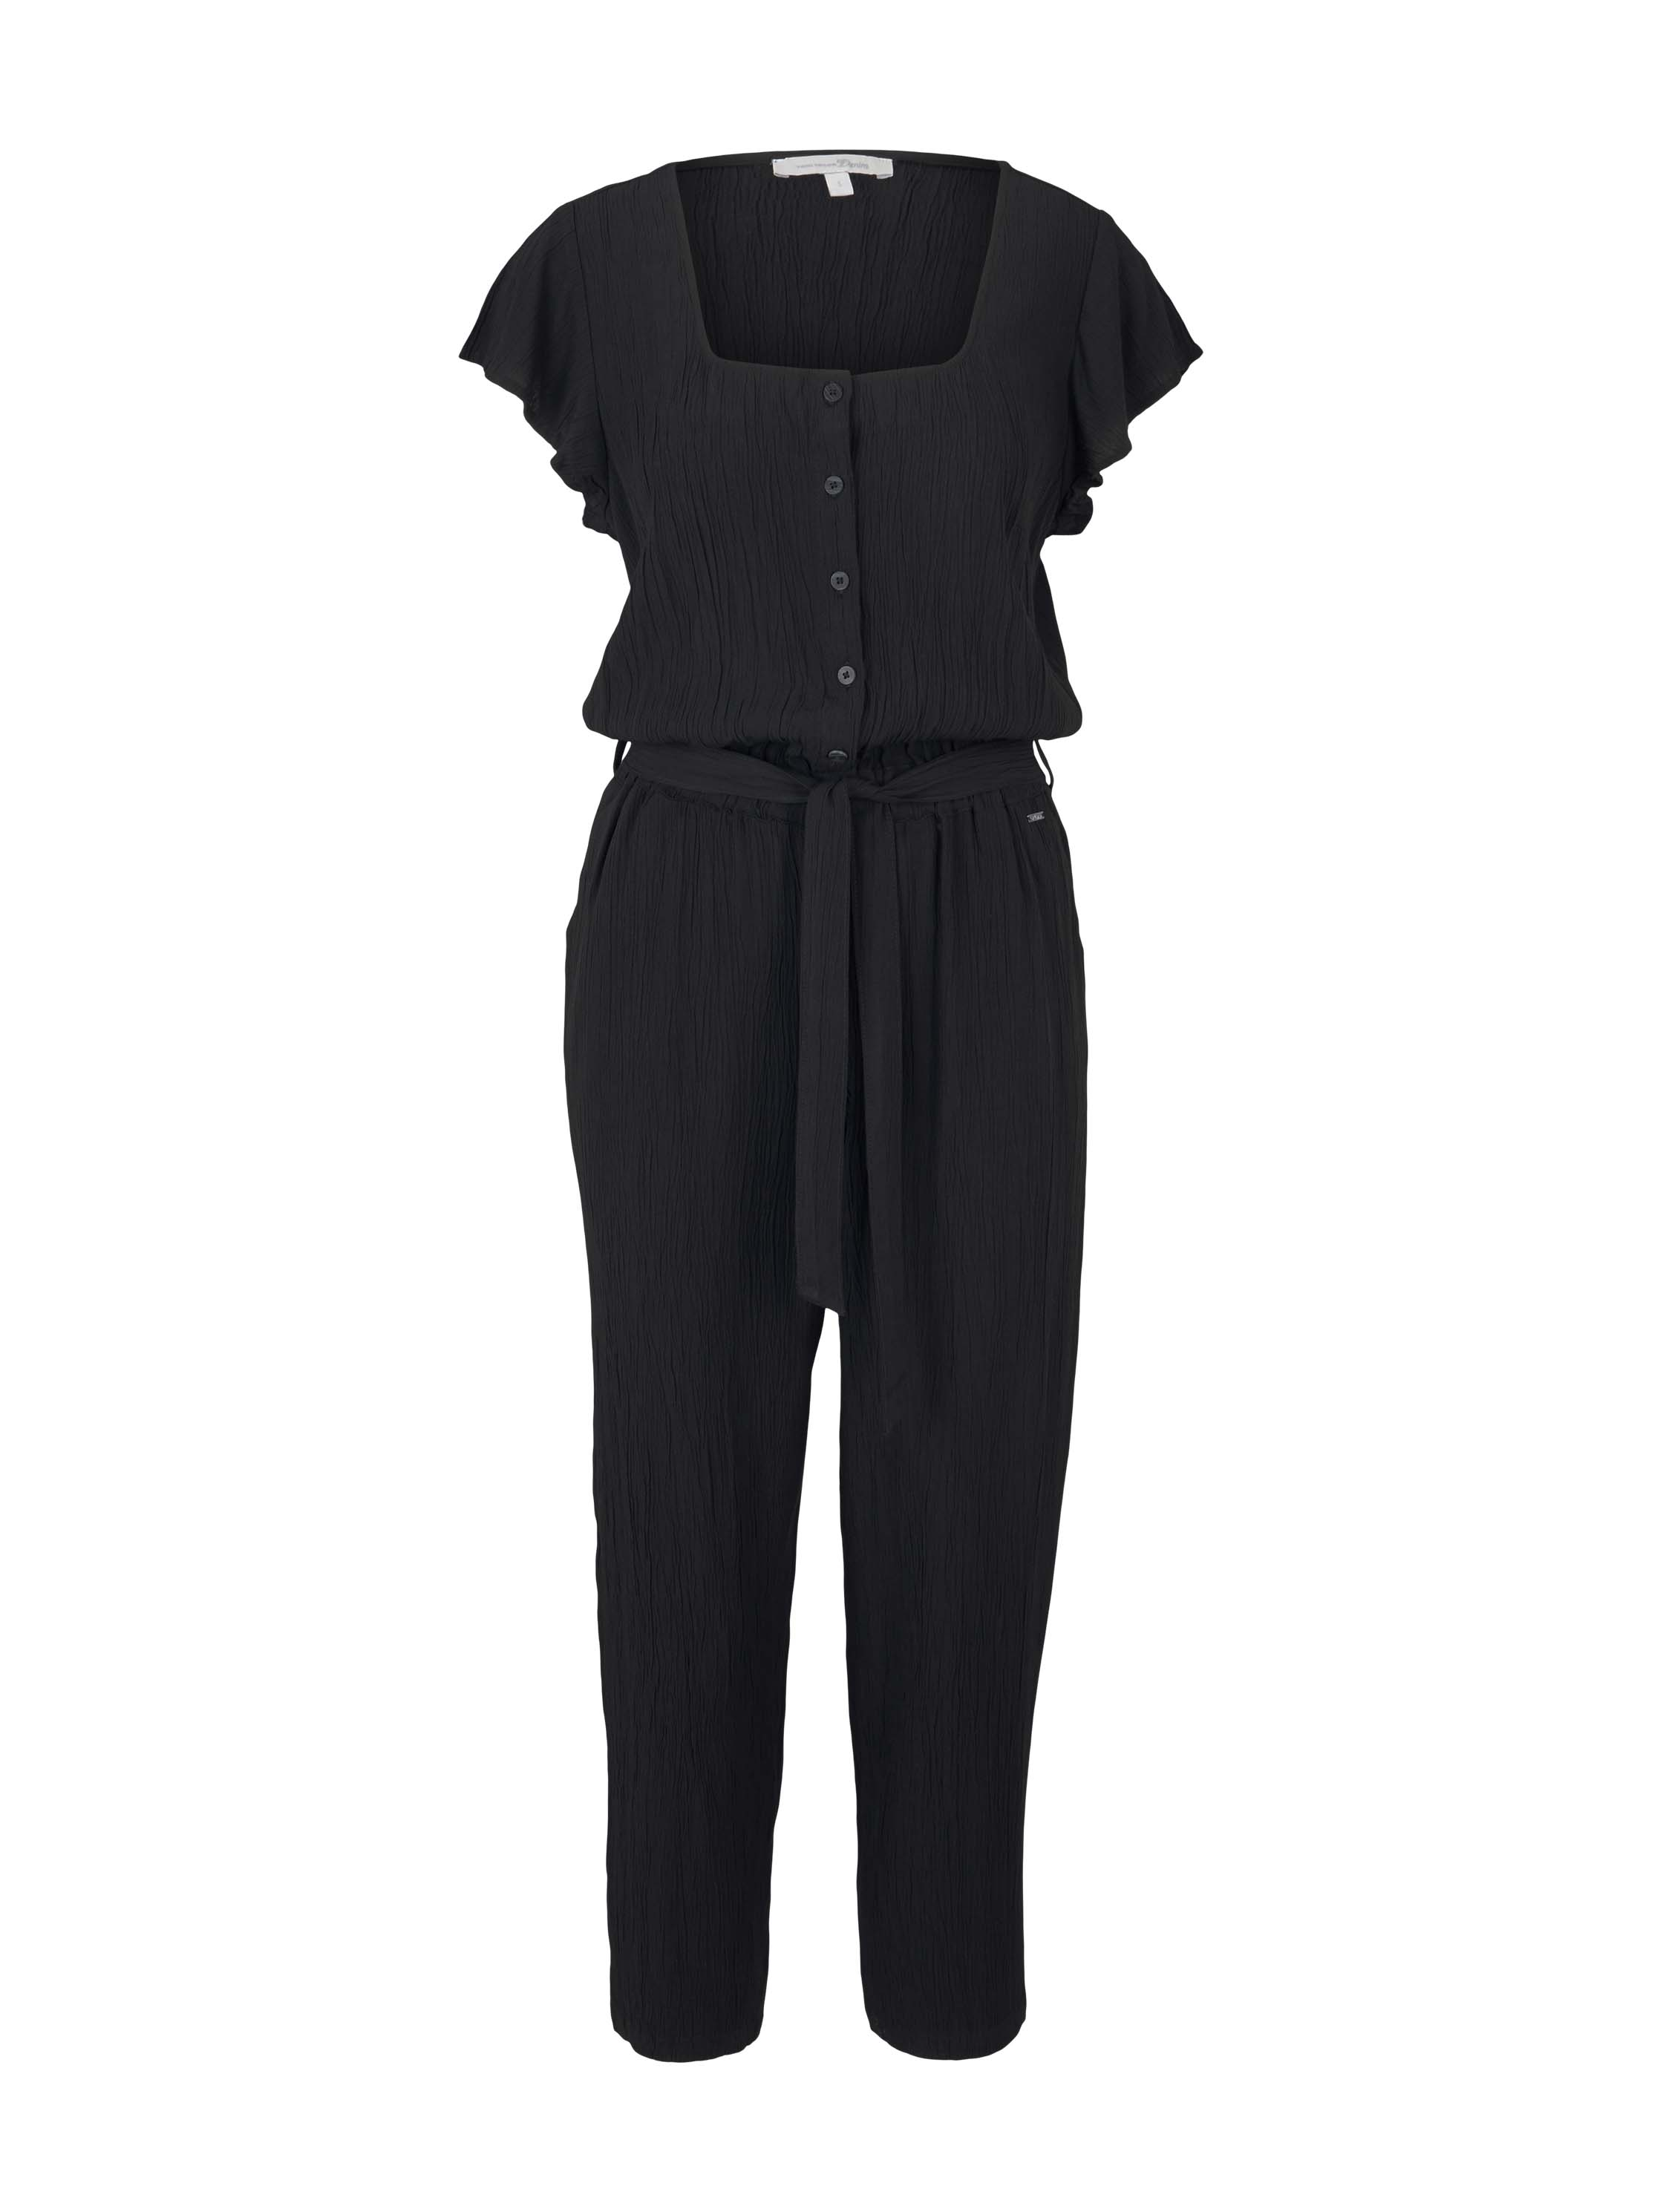 Crincled Jumpsuit, deep black